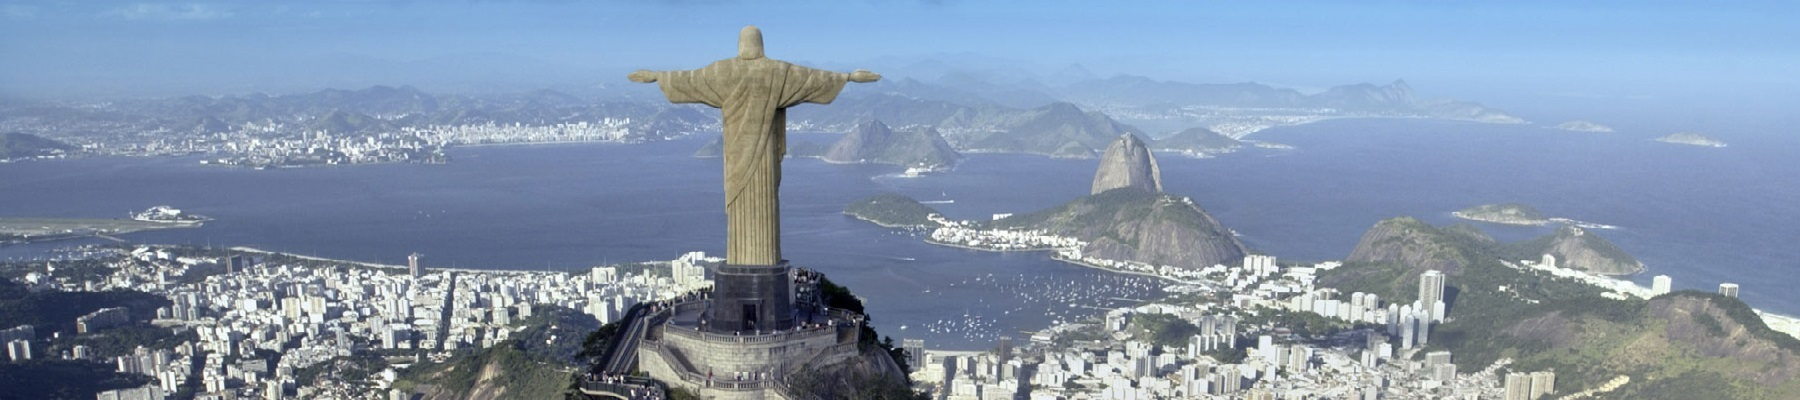 Vakantie Rio De Janeiro